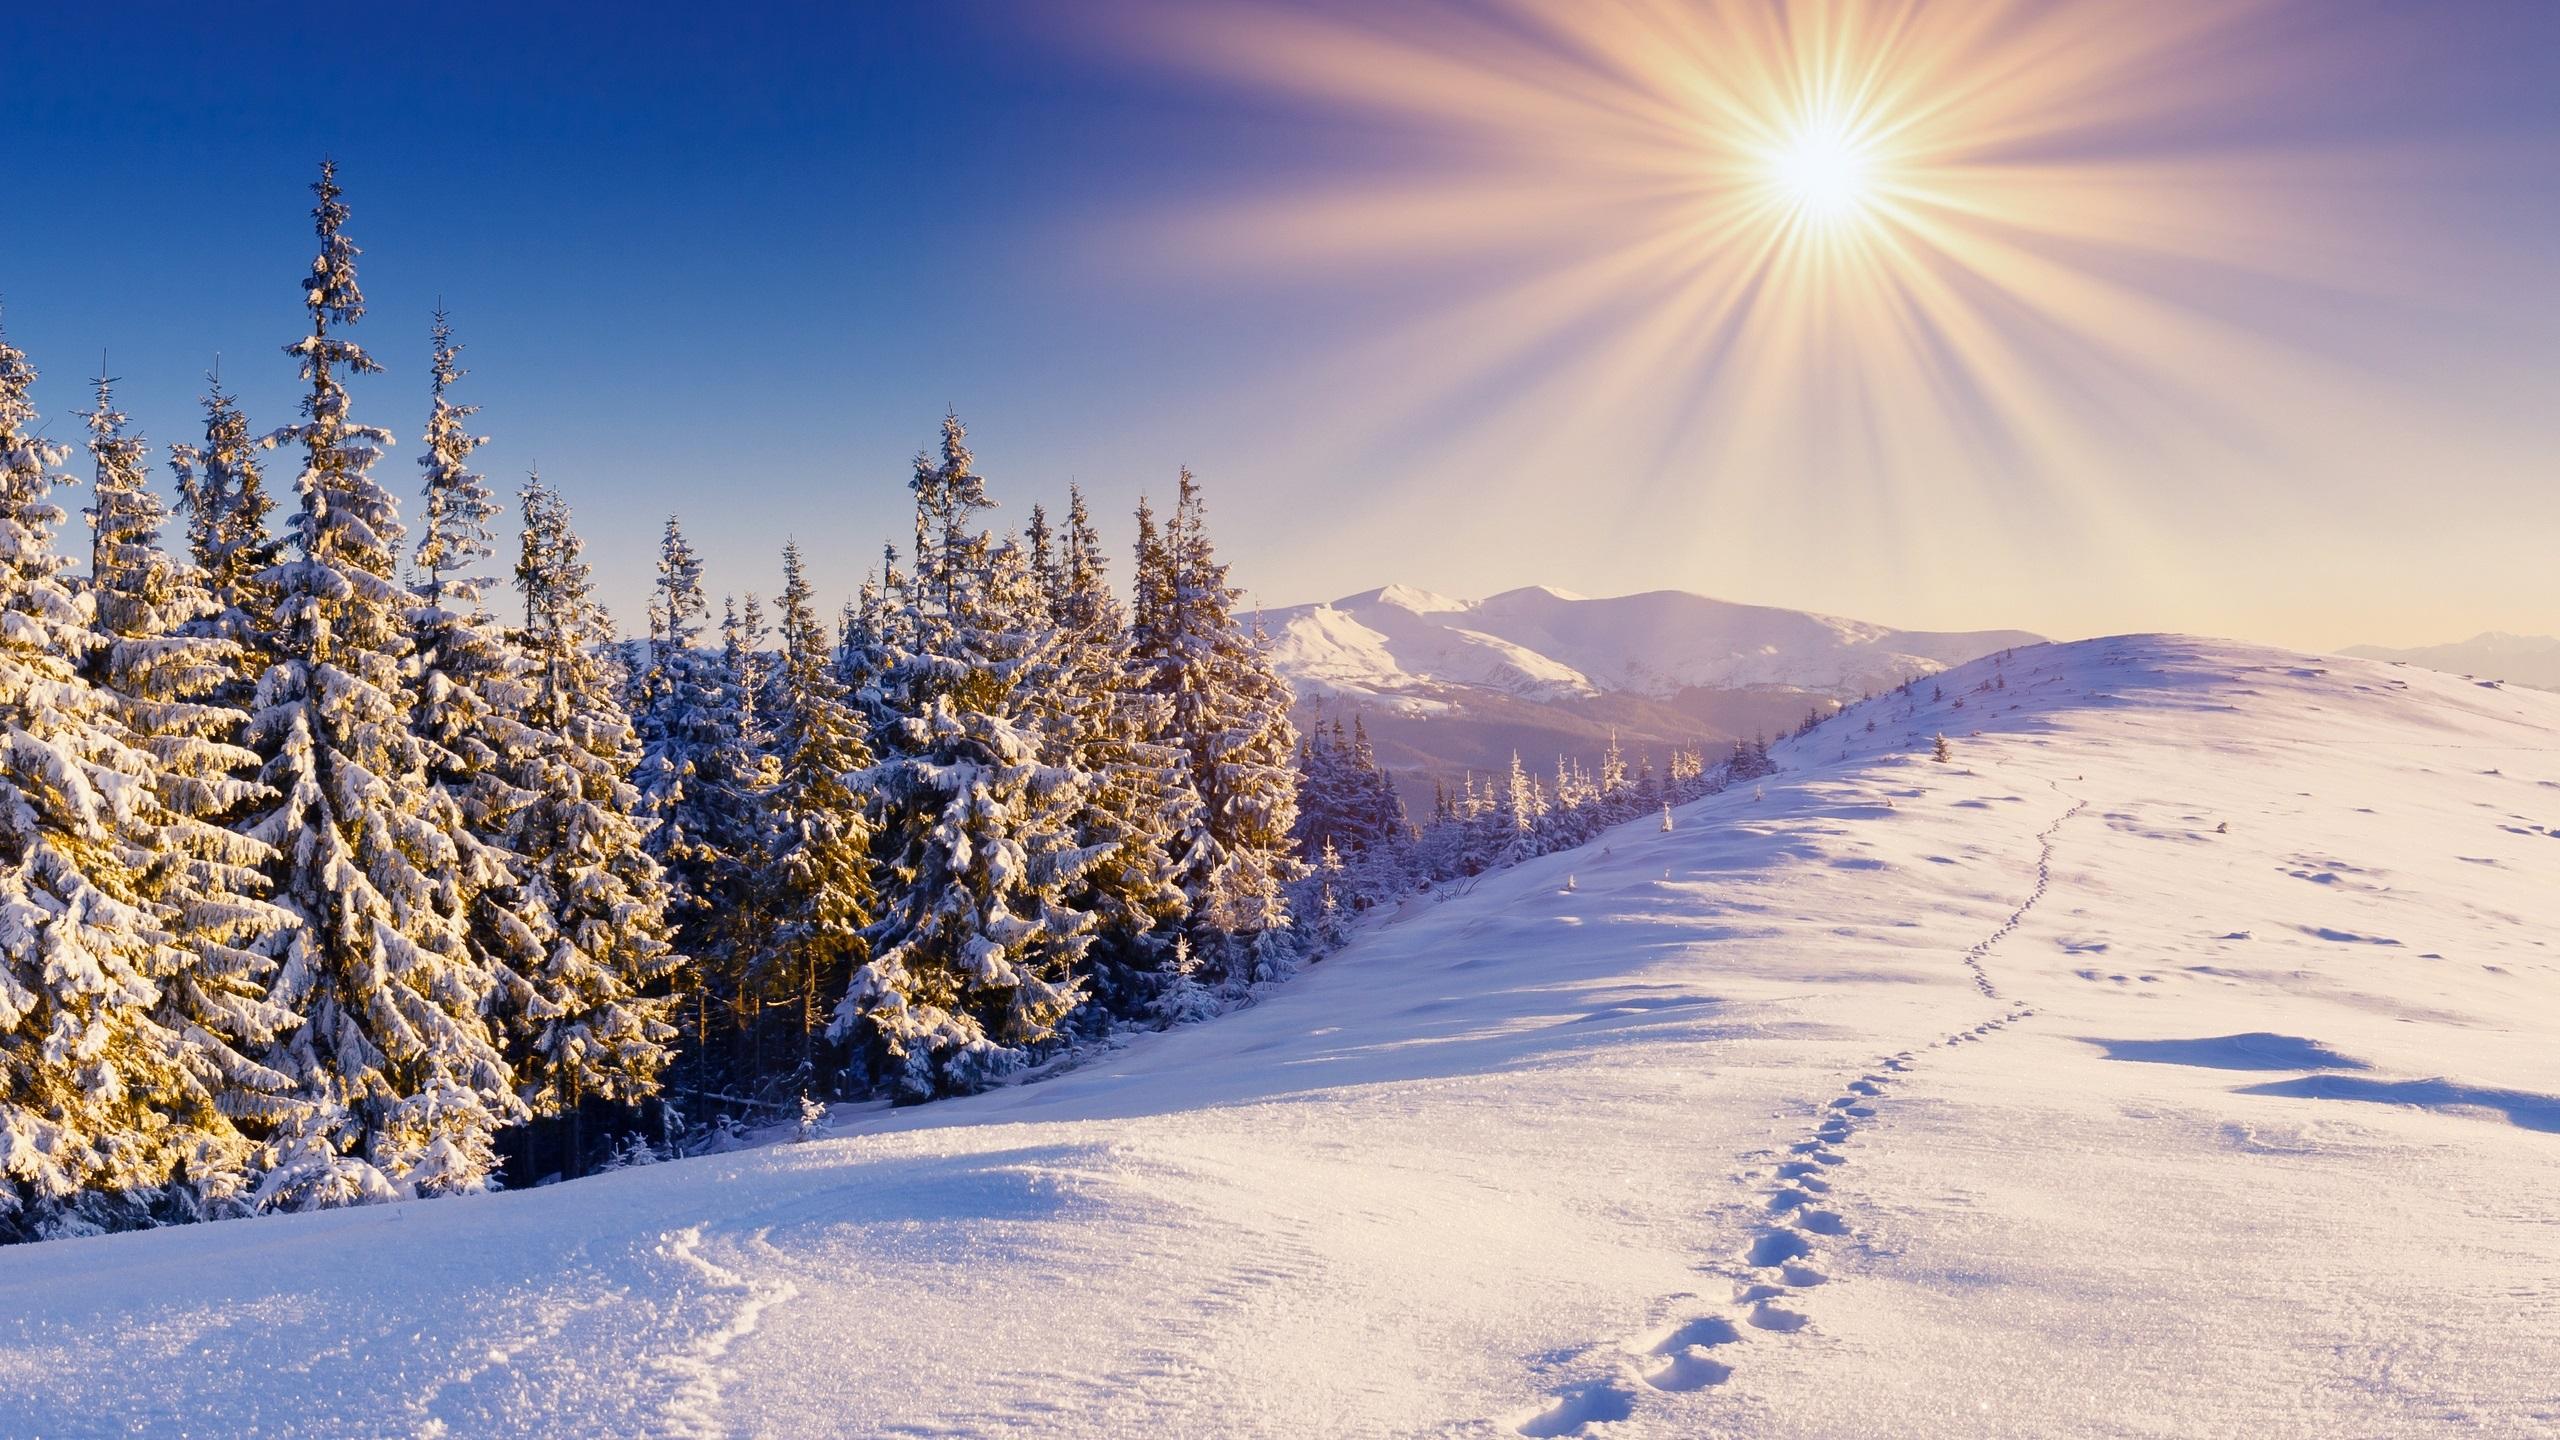 Wallpaper Winter Snow Forest Trails Mountains Sky Sun